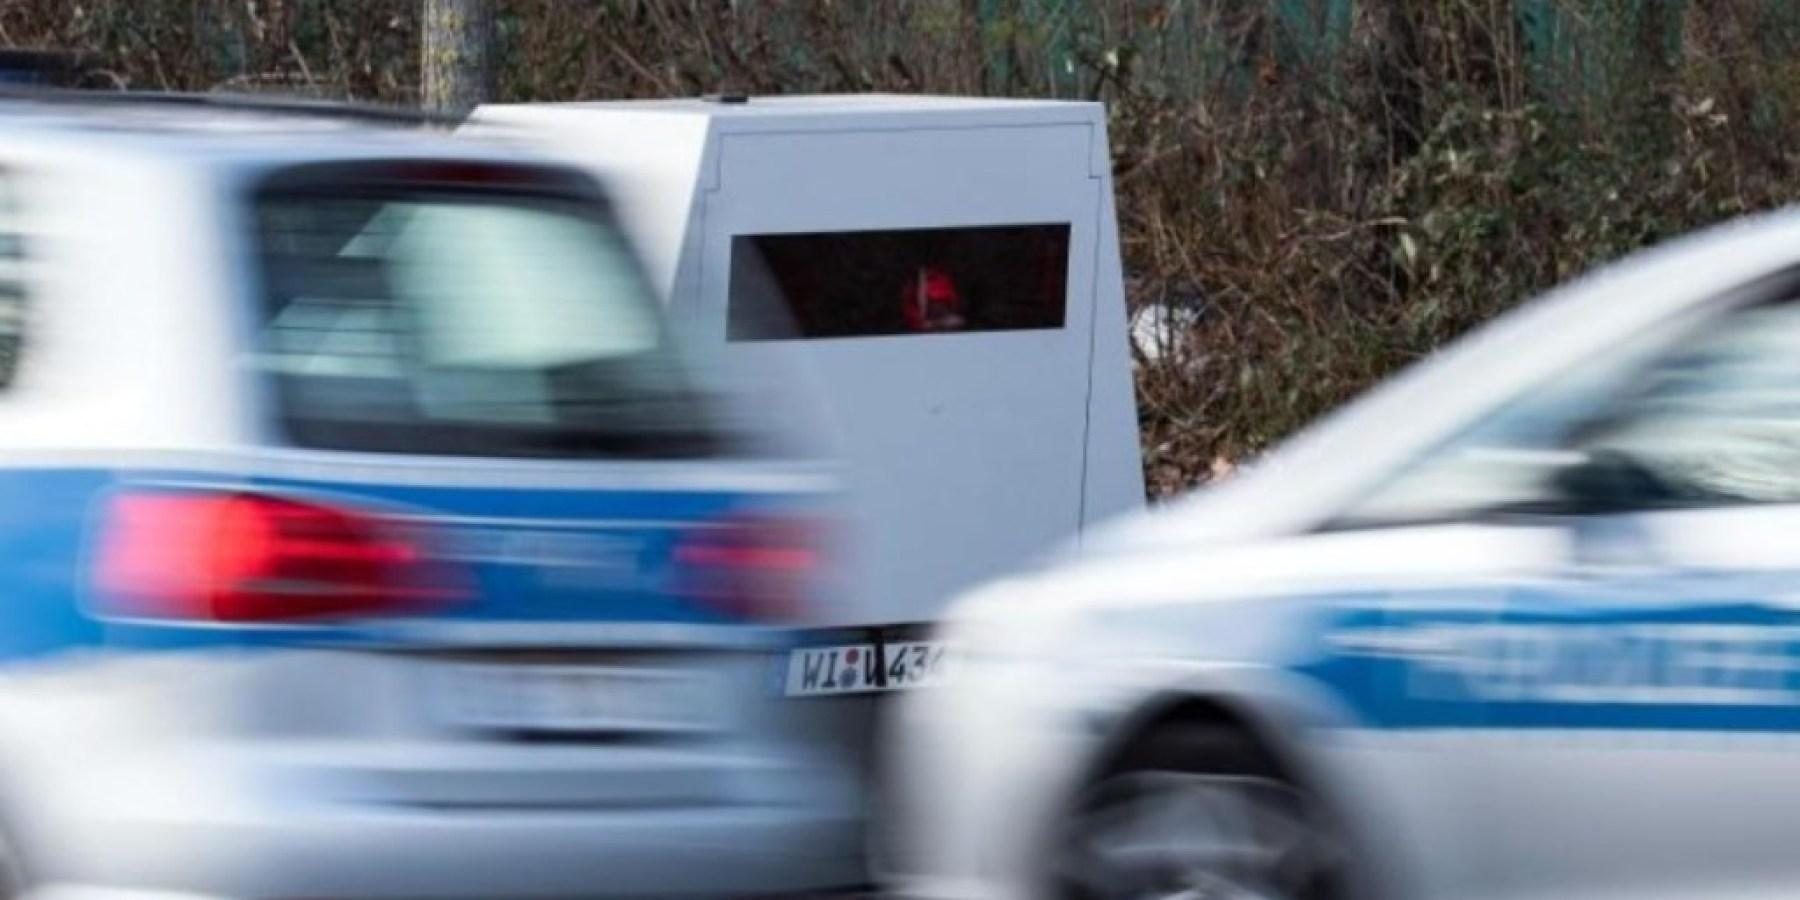 26-Jähriger nach Verfolgungsfahrt festgenommen